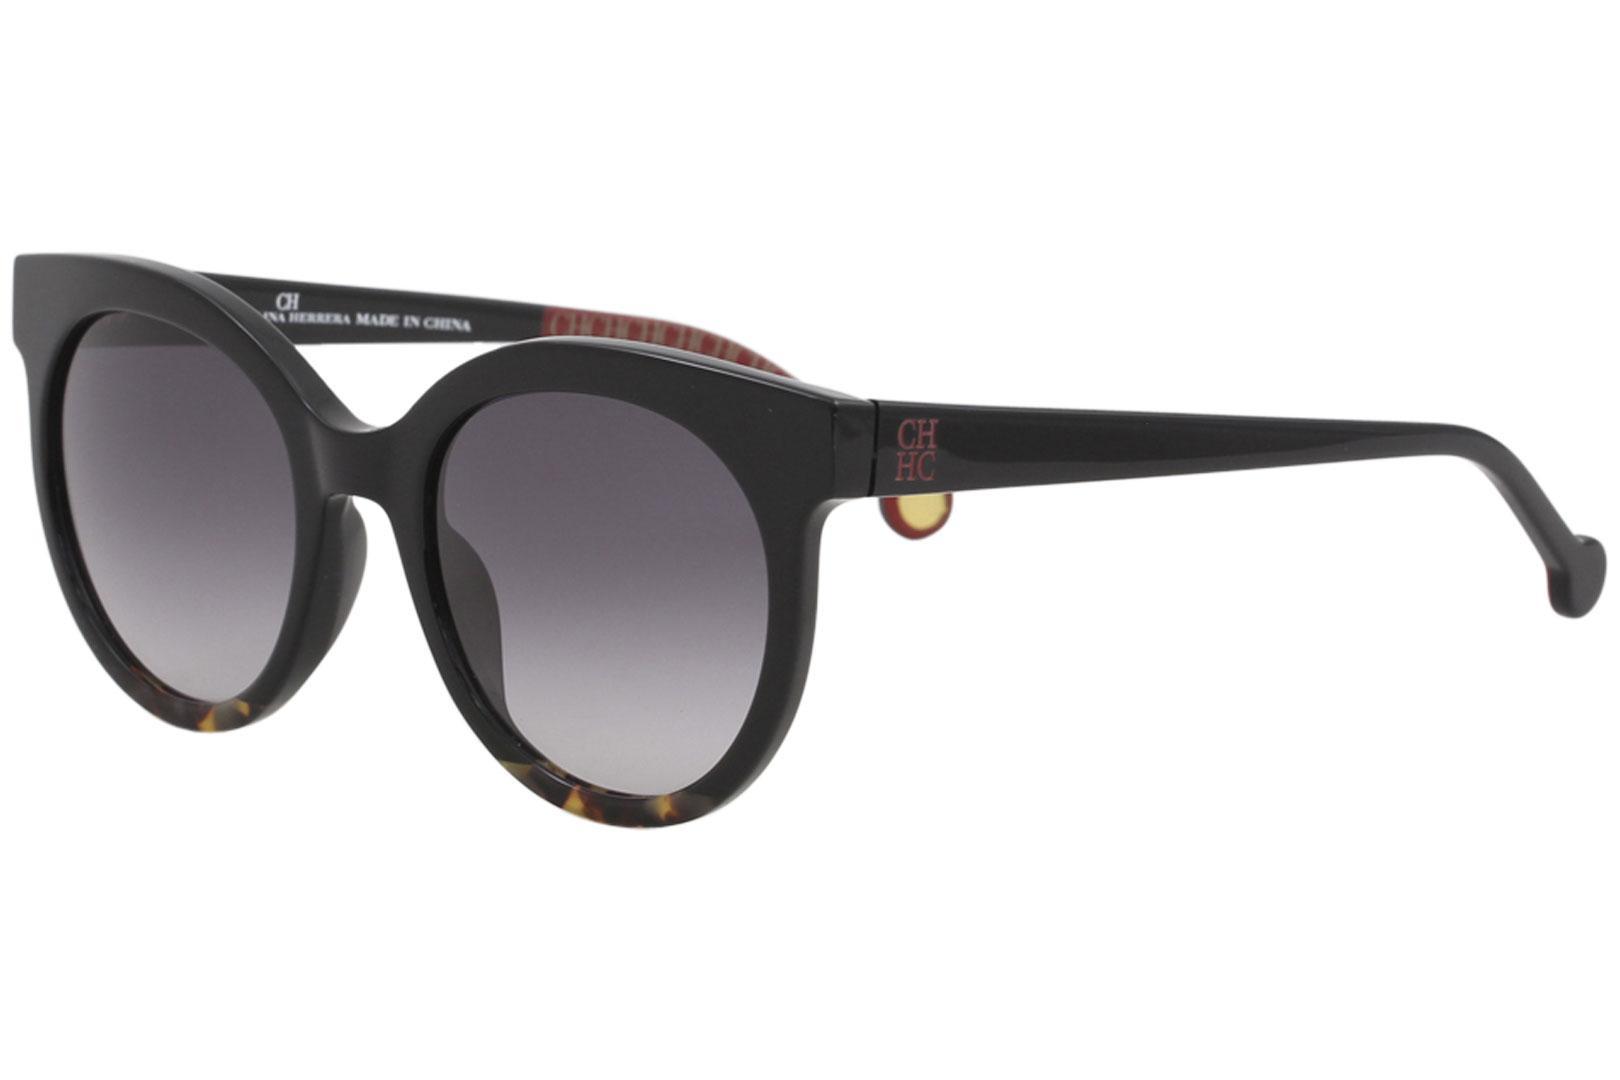 0dc45567d1 CH Carolina Herrera Women s SHE745 SHE 745 Fashion Round Sunglasses